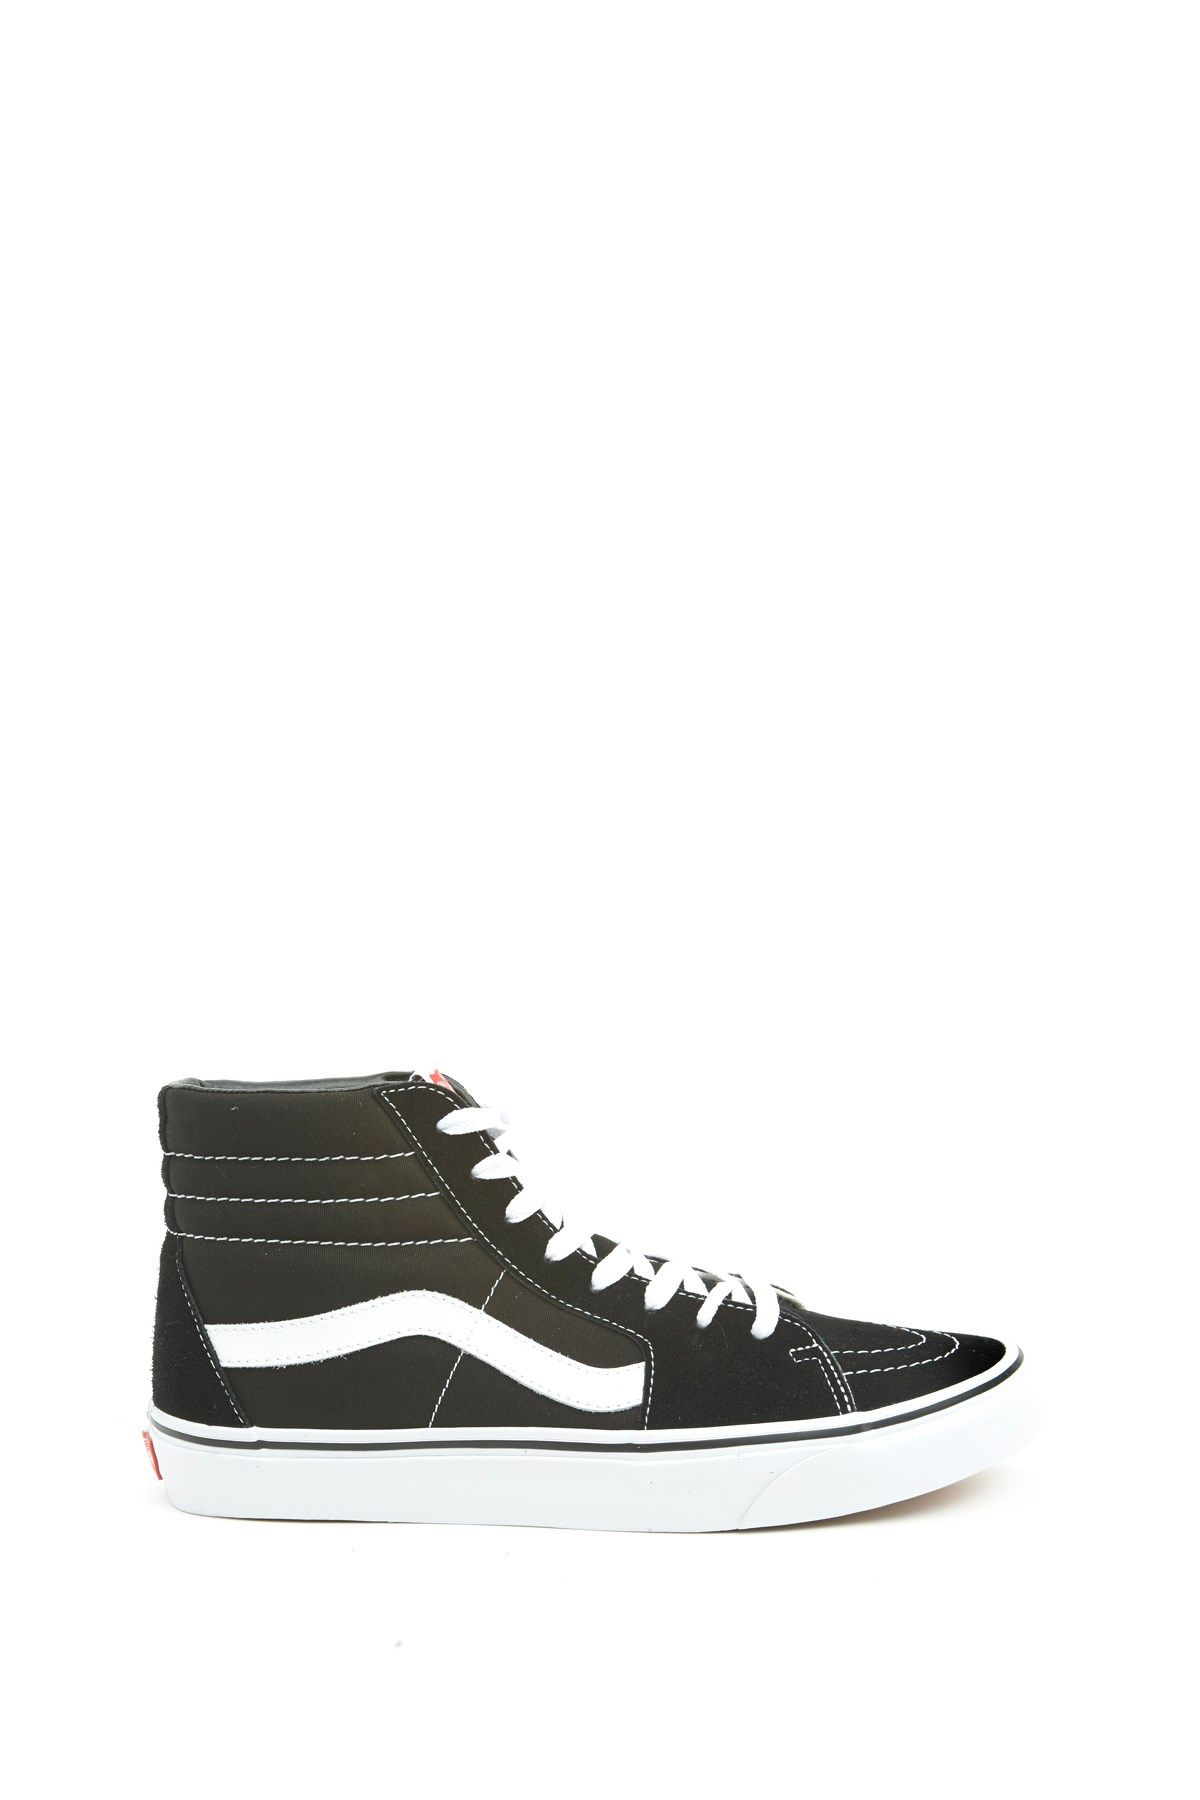 b44899aa845e VANS sk8 hi sneakers.  vans  shoes Shop Vans